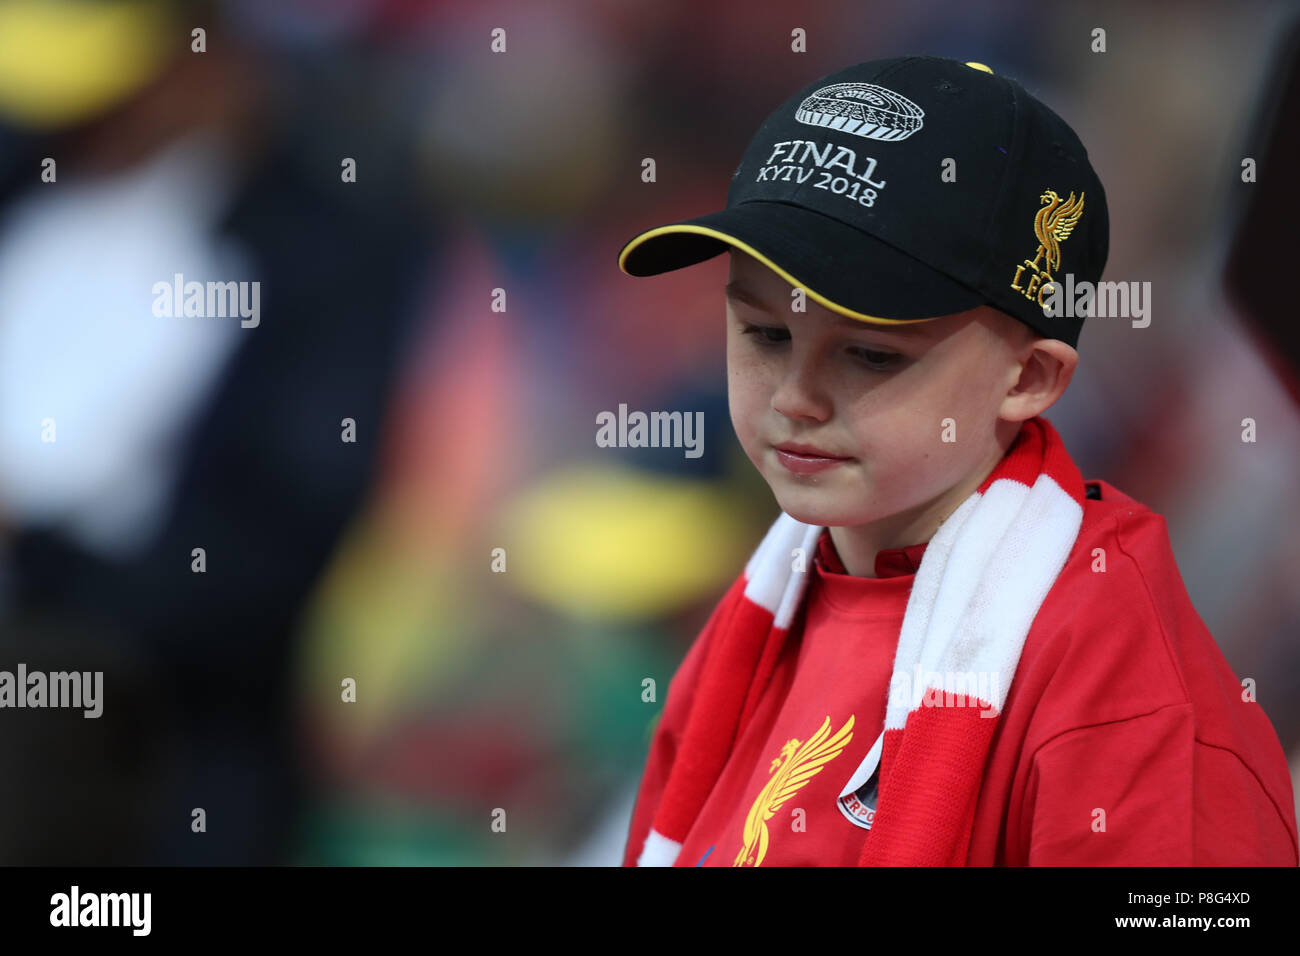 KYIV, UKRAINE - MAY 26, 2018: Upset Liverpool young fan